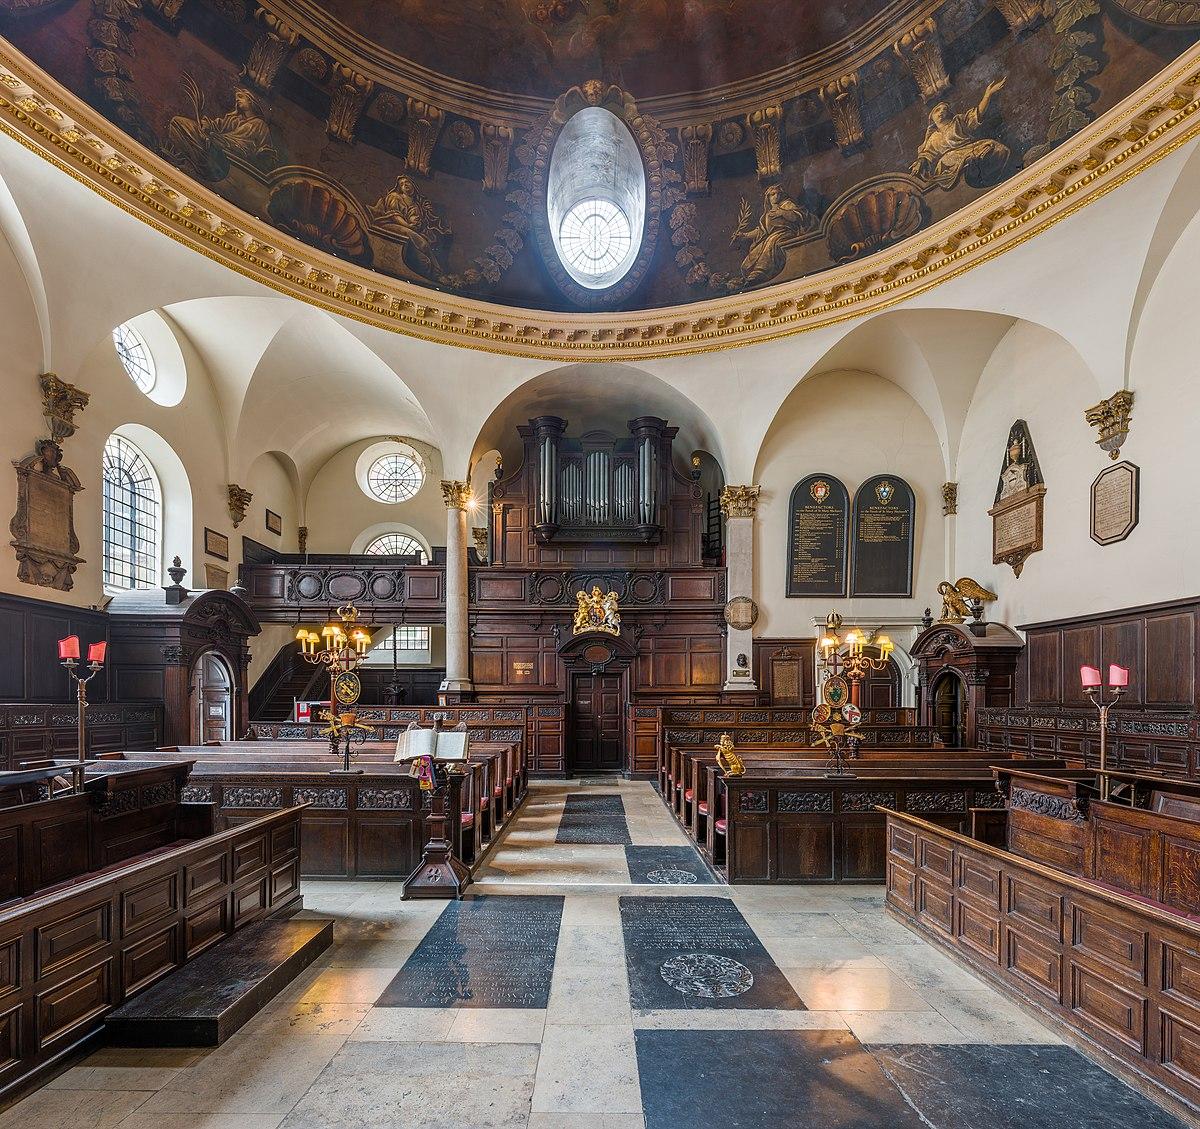 Px St Mary Abchurch Towards Organ C London C Uk Diliff